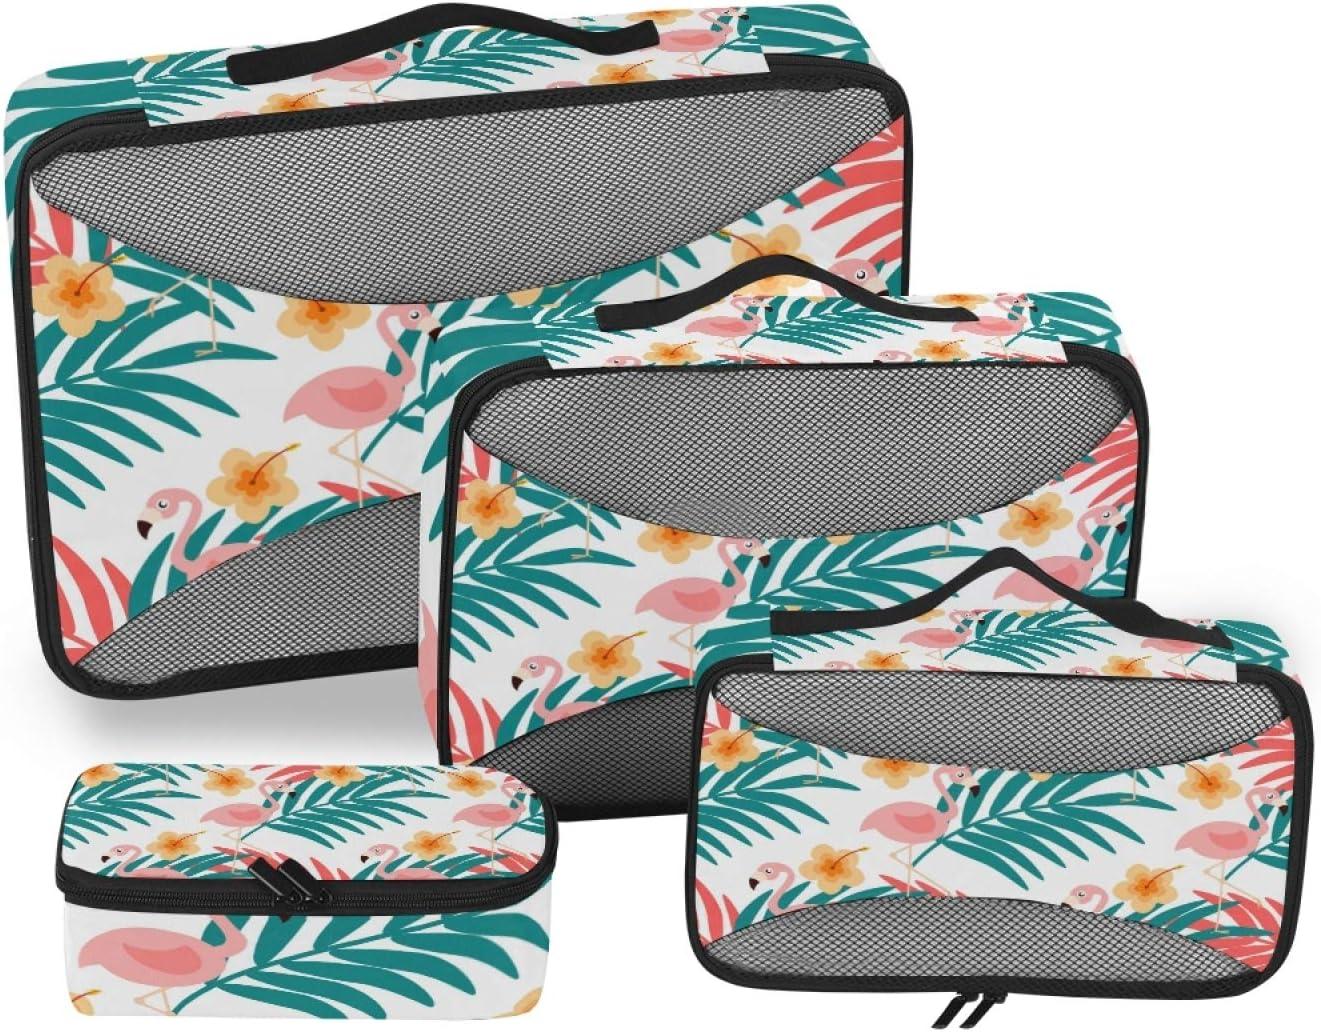 Flamingo Packing Storage Bag Accessories 4-Pcs Organizer Ranking TOP7 Soldering Travel